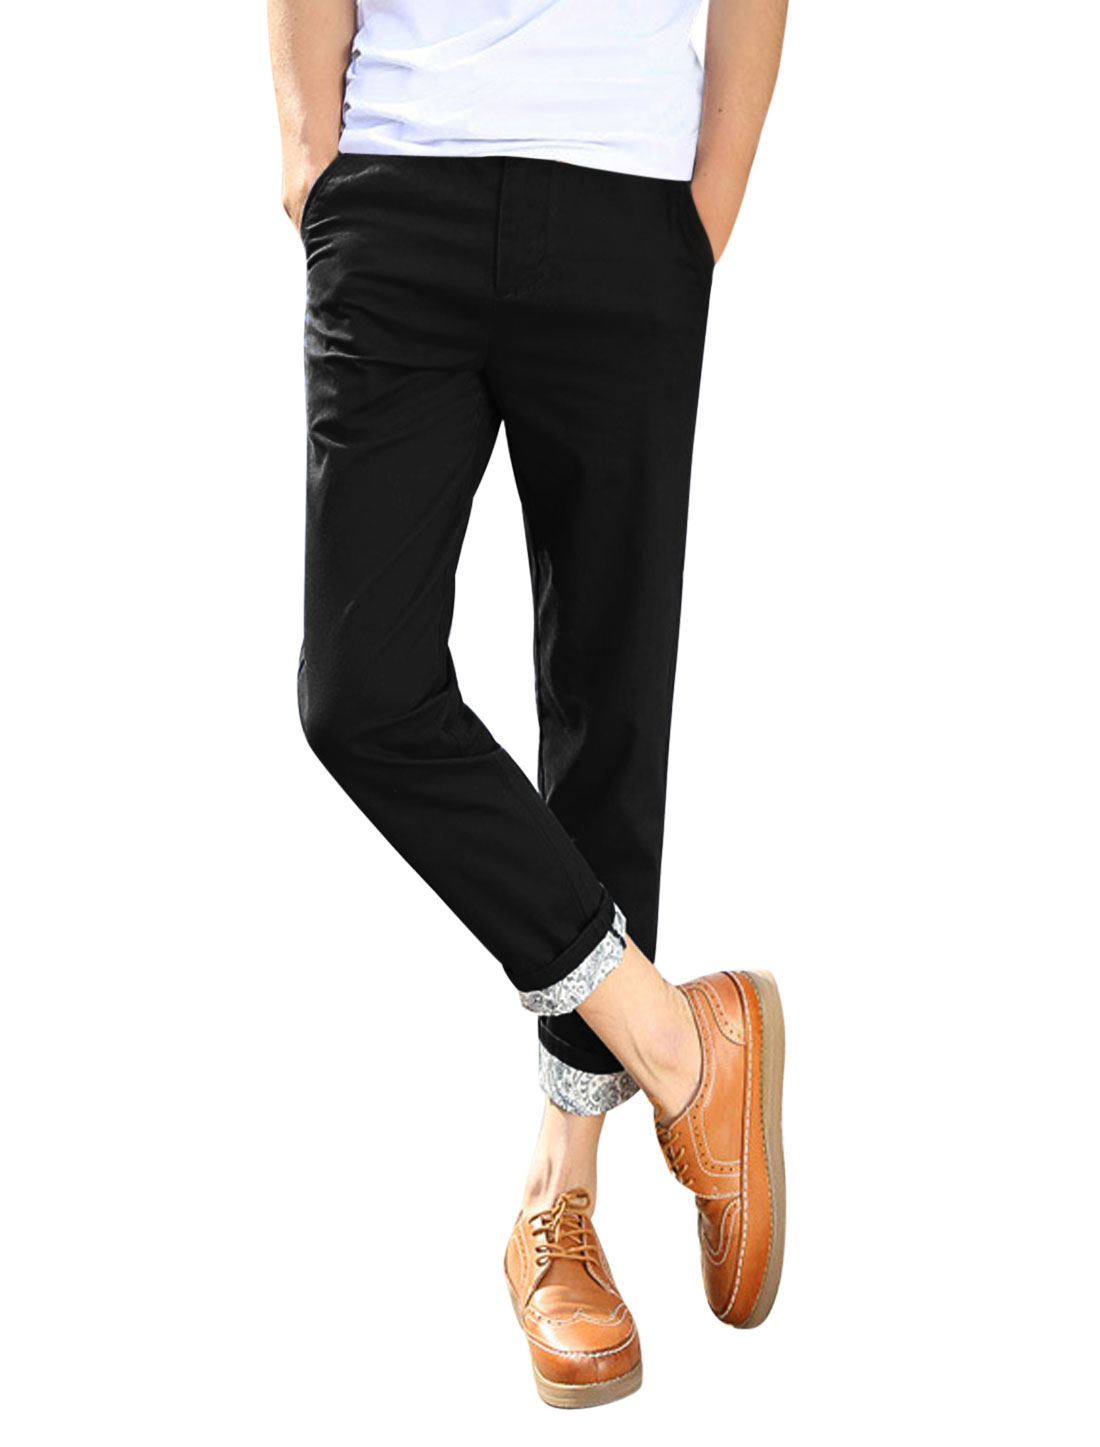 Man Jacquard Design Detail Mid Rise Leisure Slim Fit Cropped Pants Black W32